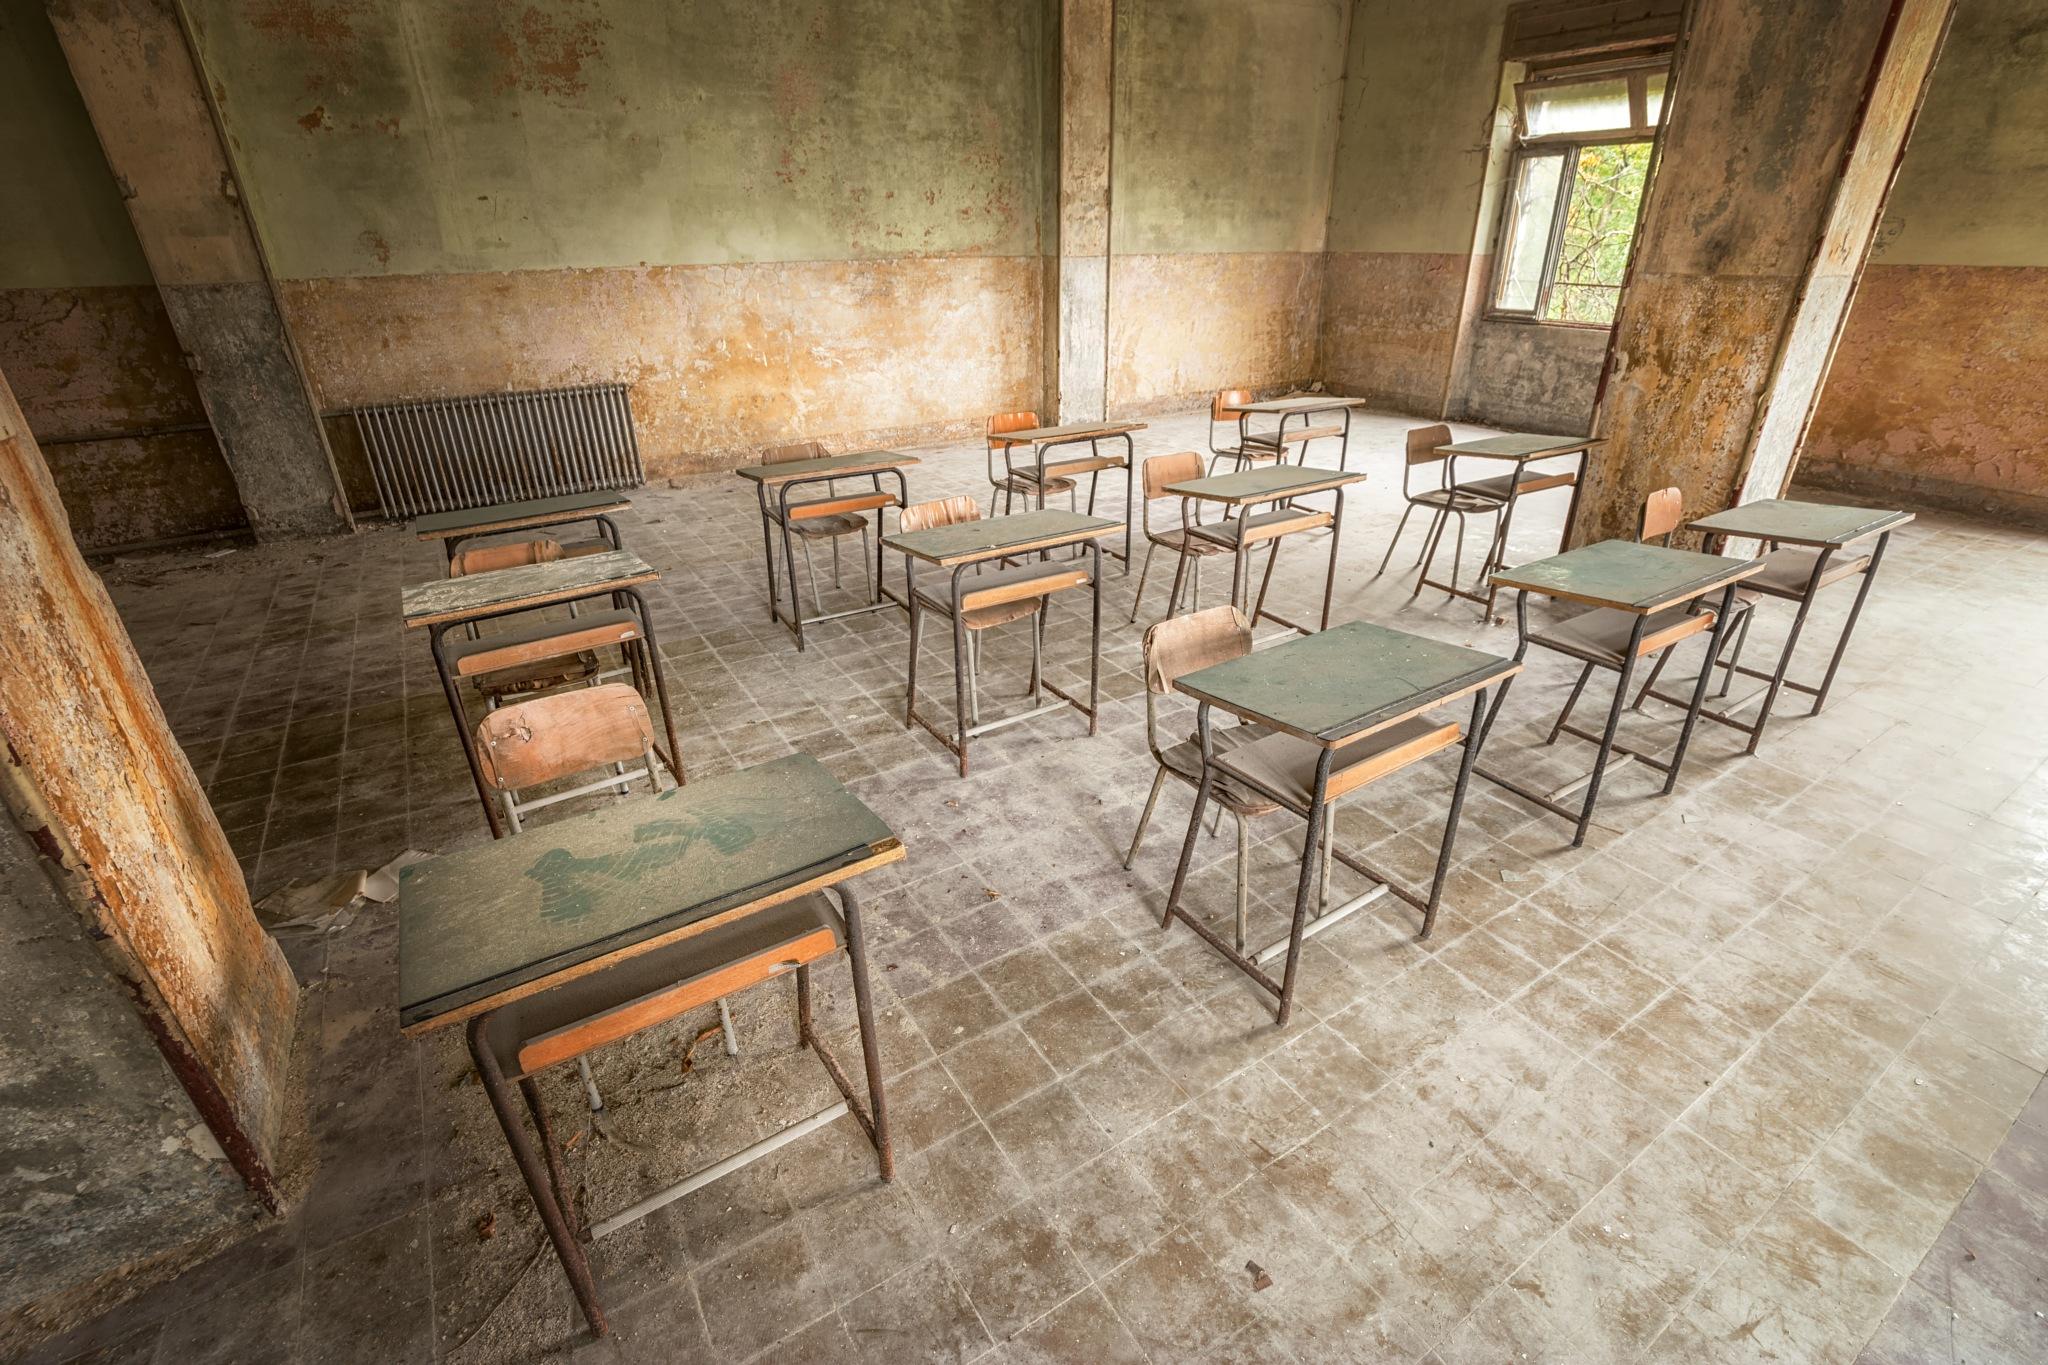 The Classroom by esmeralda.holman